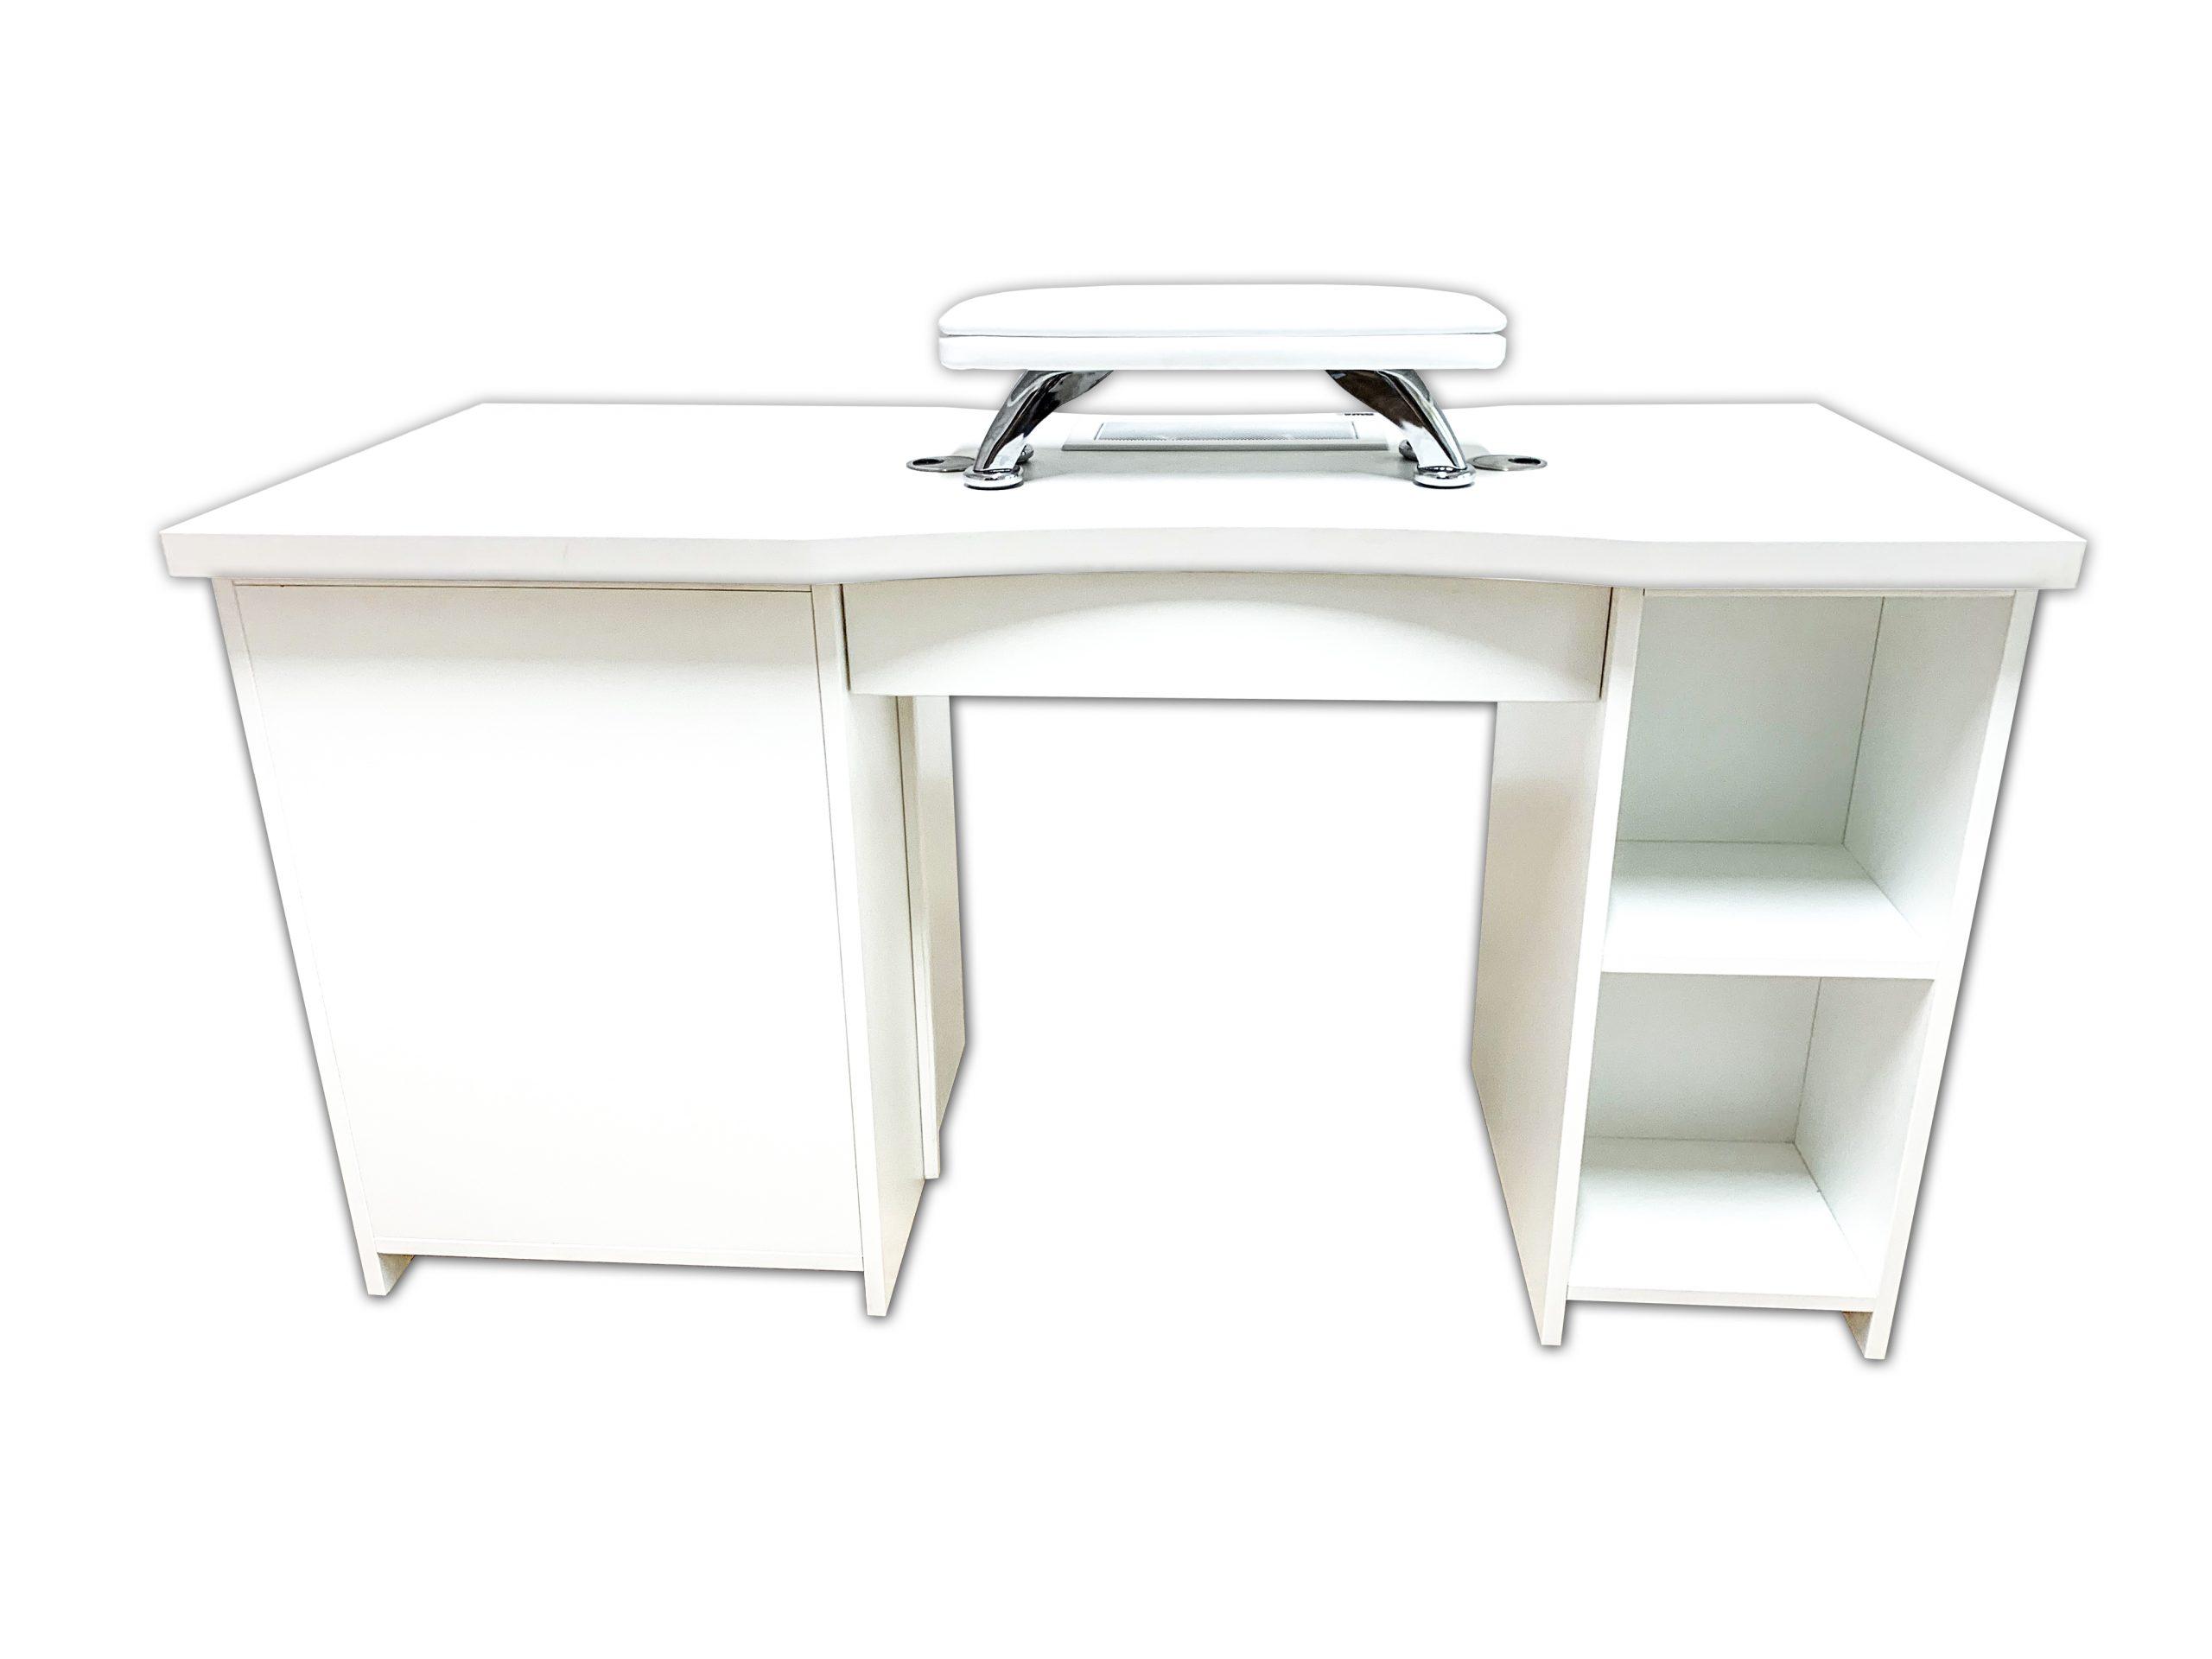 Manikérsky stôl BASIC - odsávanie + filter v skrinke